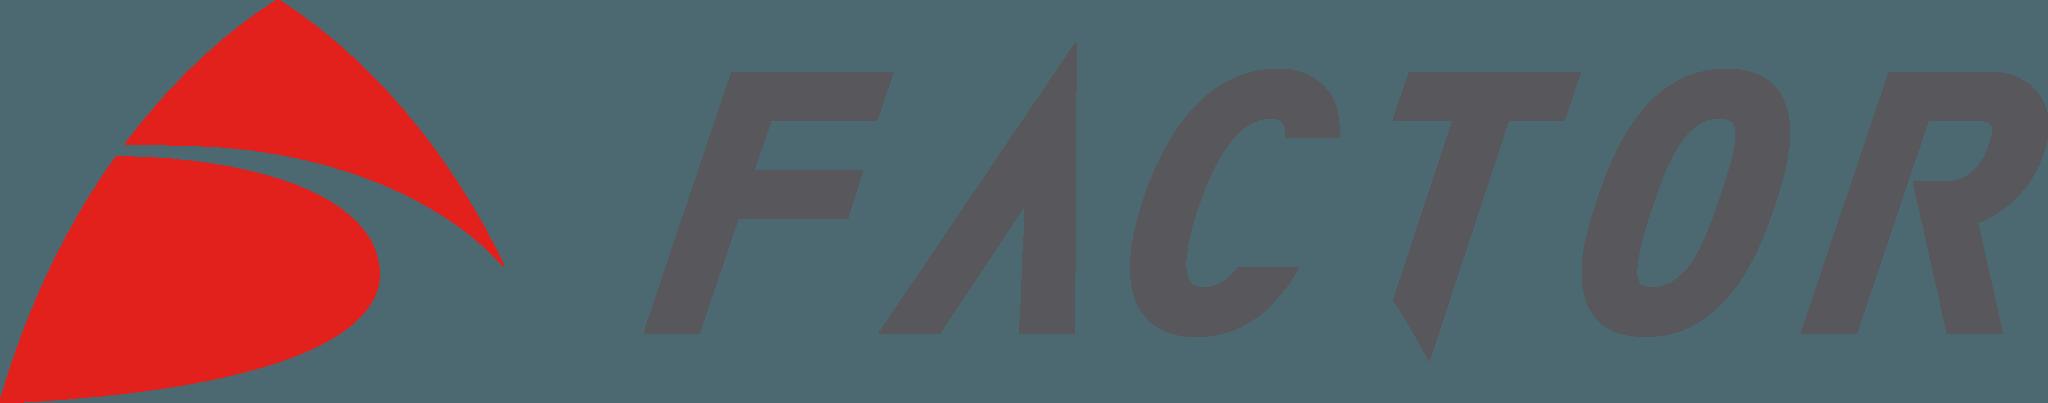 Read Factor Bikes Reviews